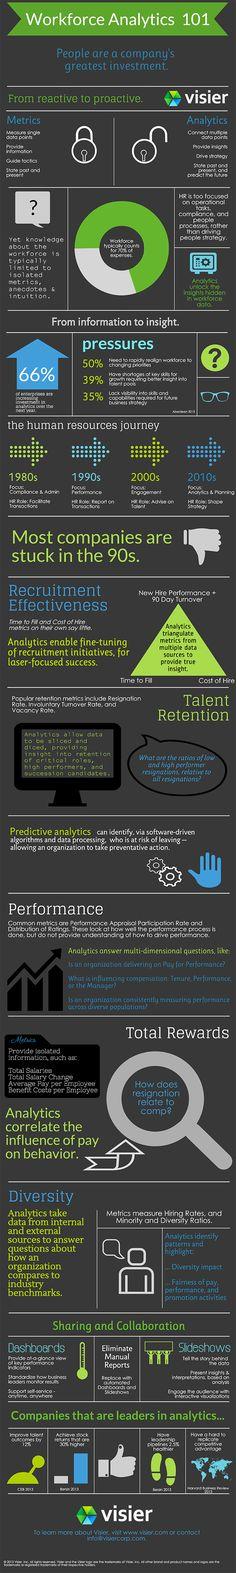 Workforce Analytics 101 Infographic